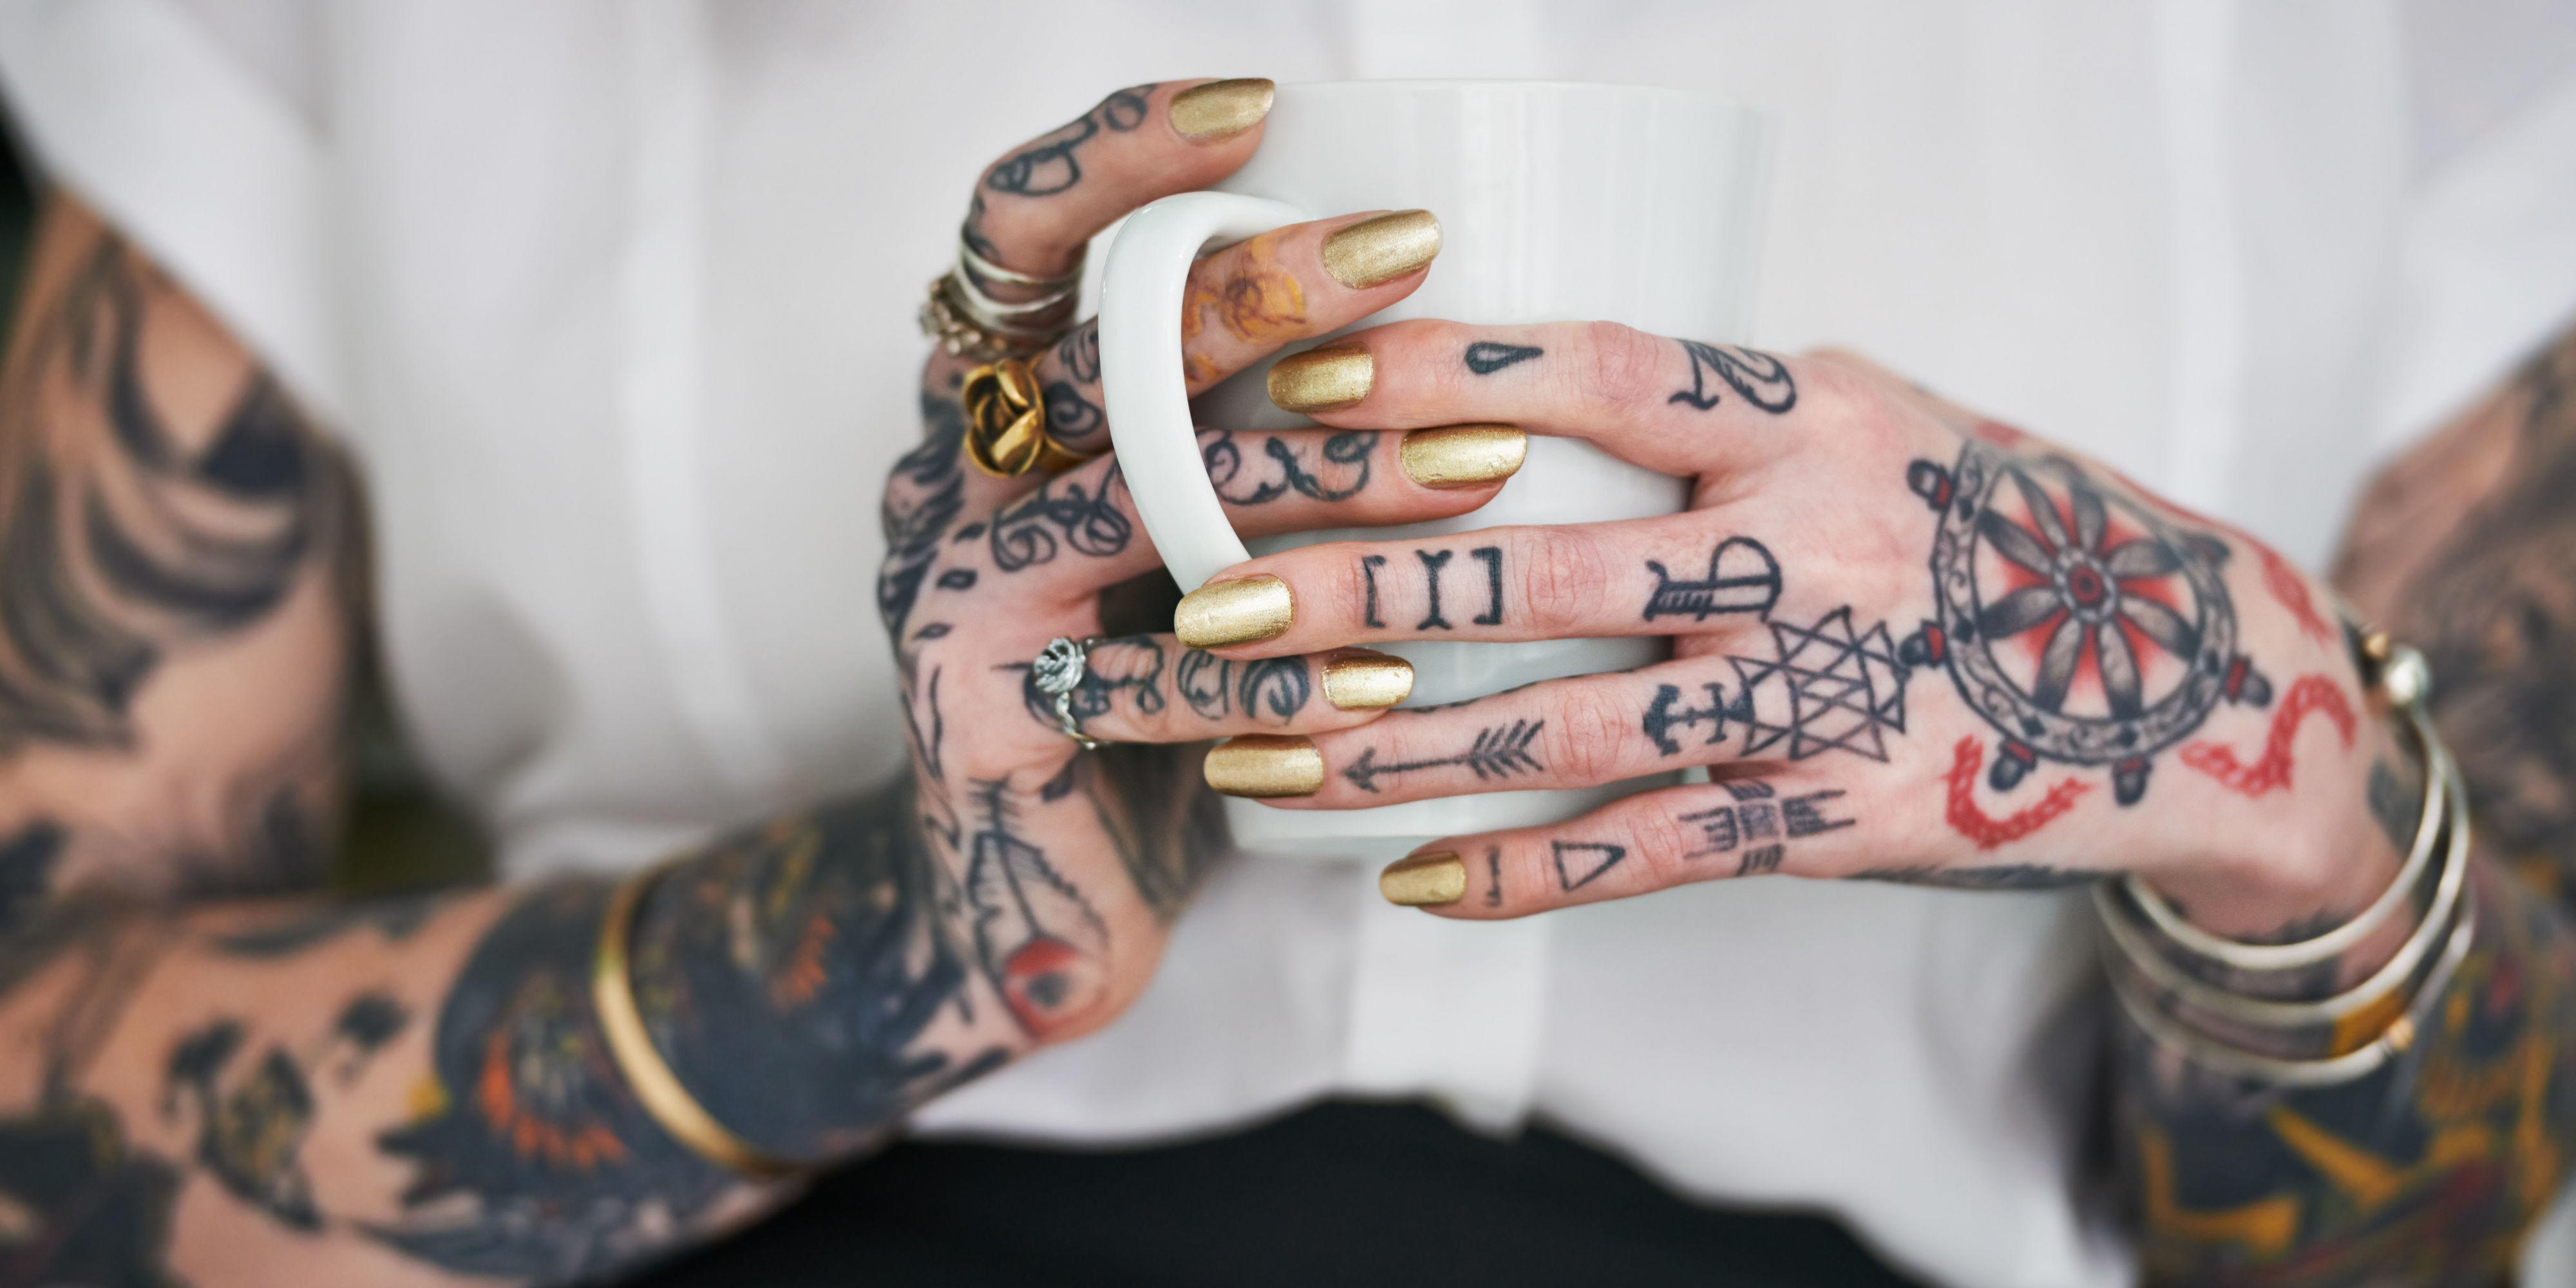 10 Amazing Tattoo Artists to Follow on Instagram